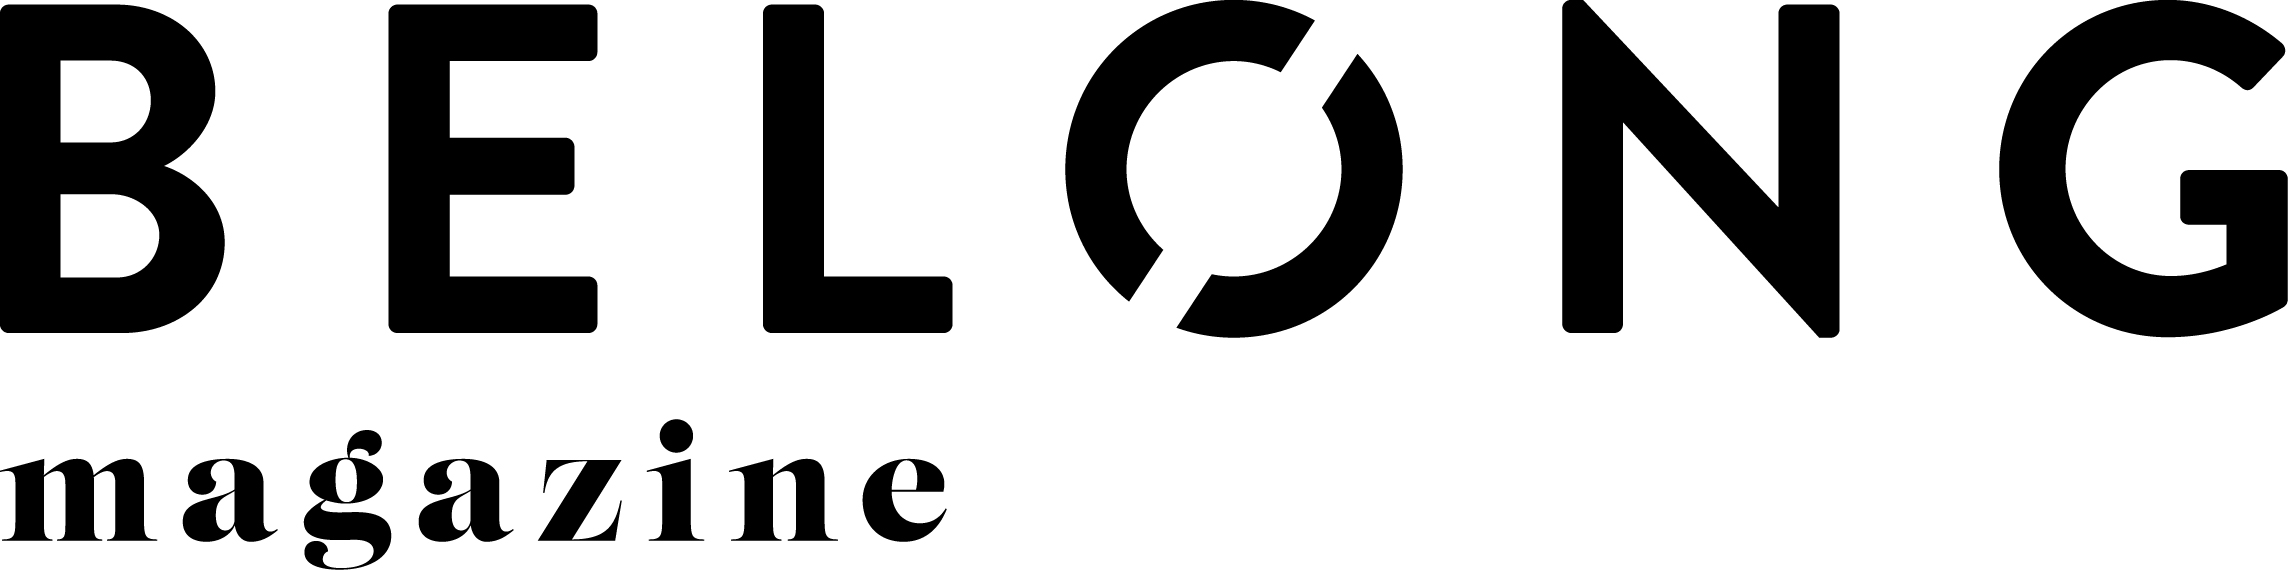 Belong Mag Logo-3.jpg